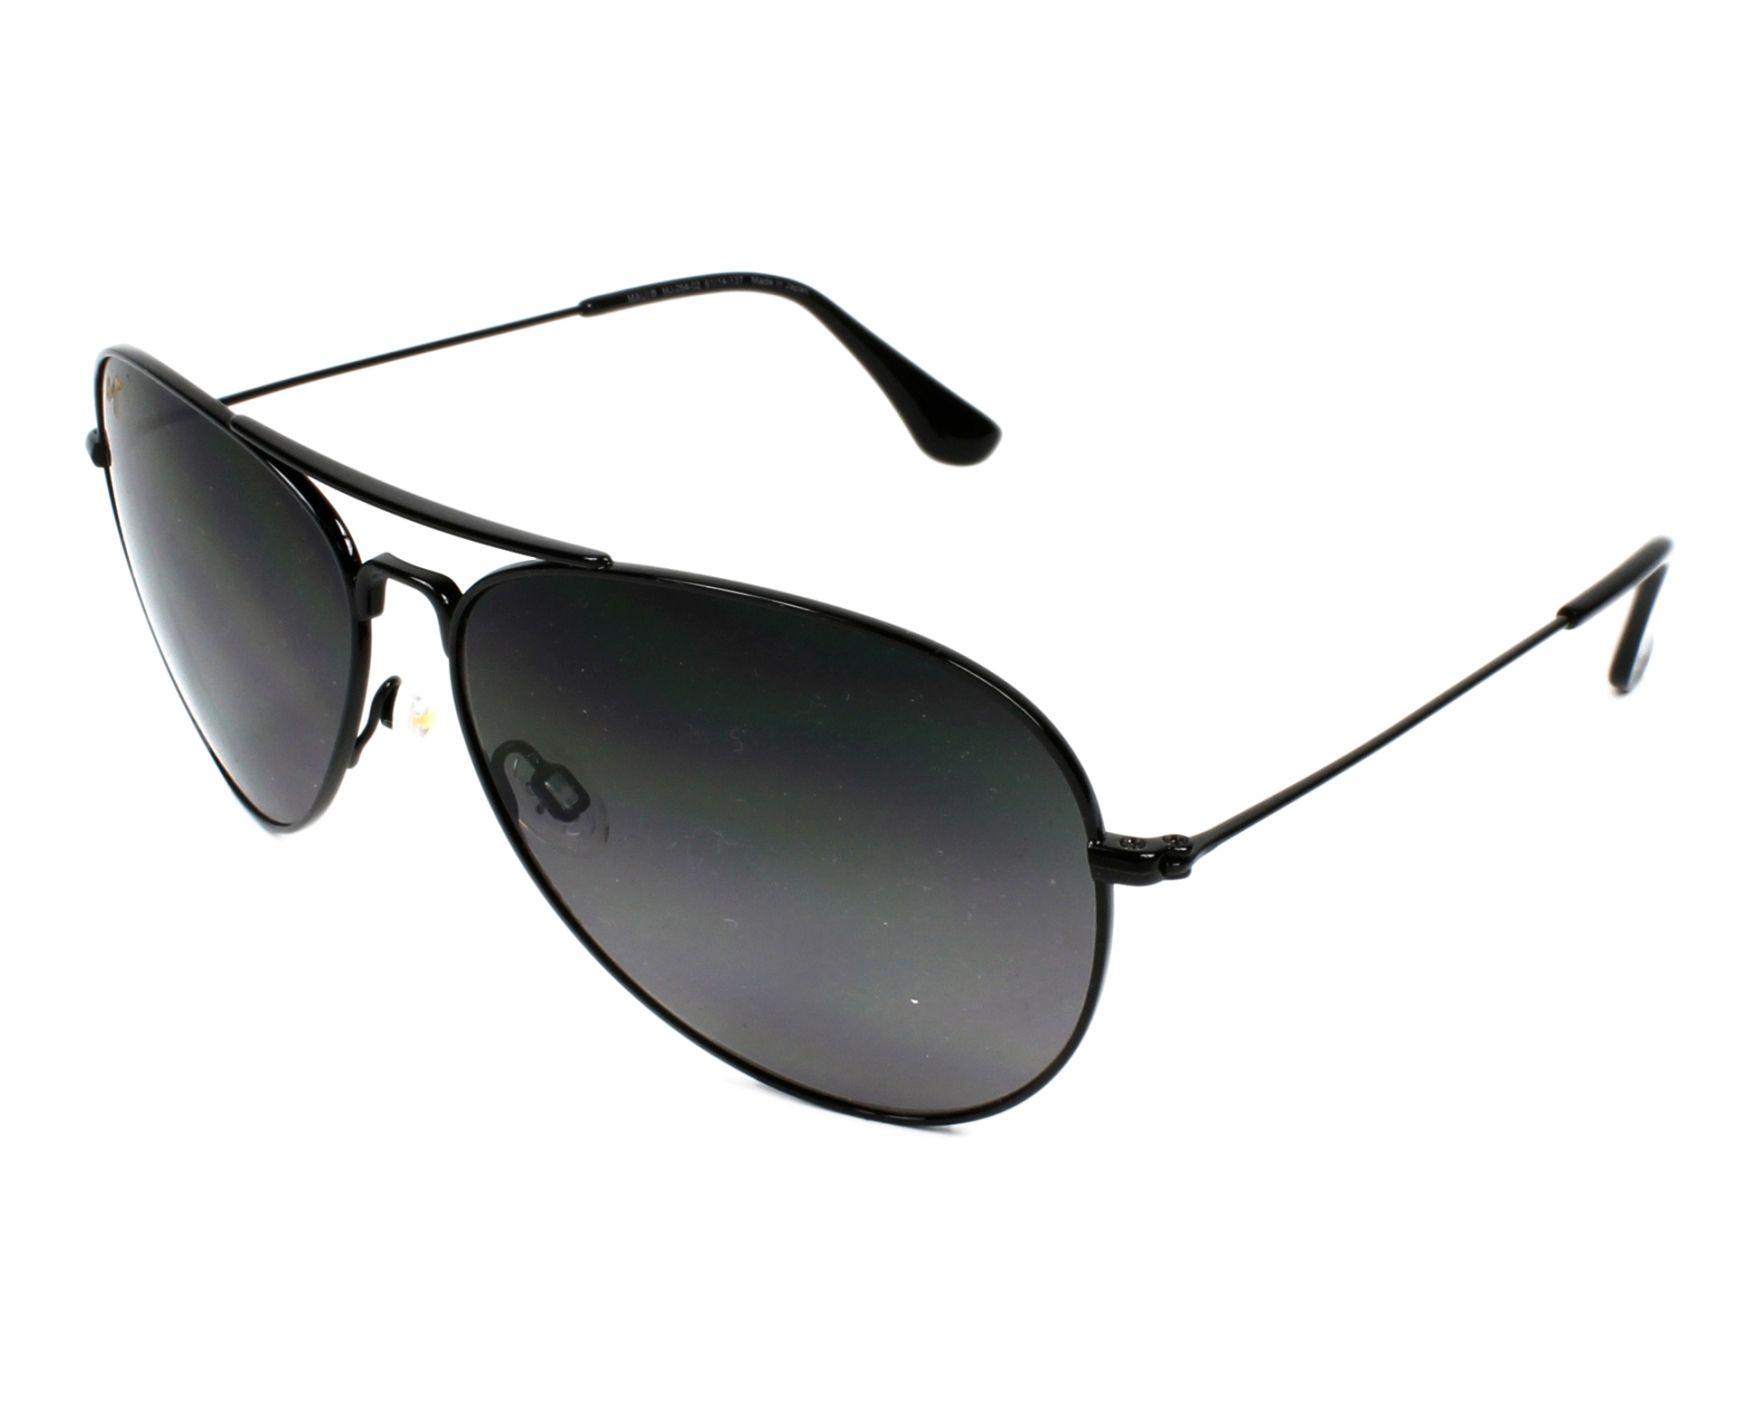 78bb5a5d7c Polarized. Sunglasses Maui Jim GS-264 02 - Black profile view